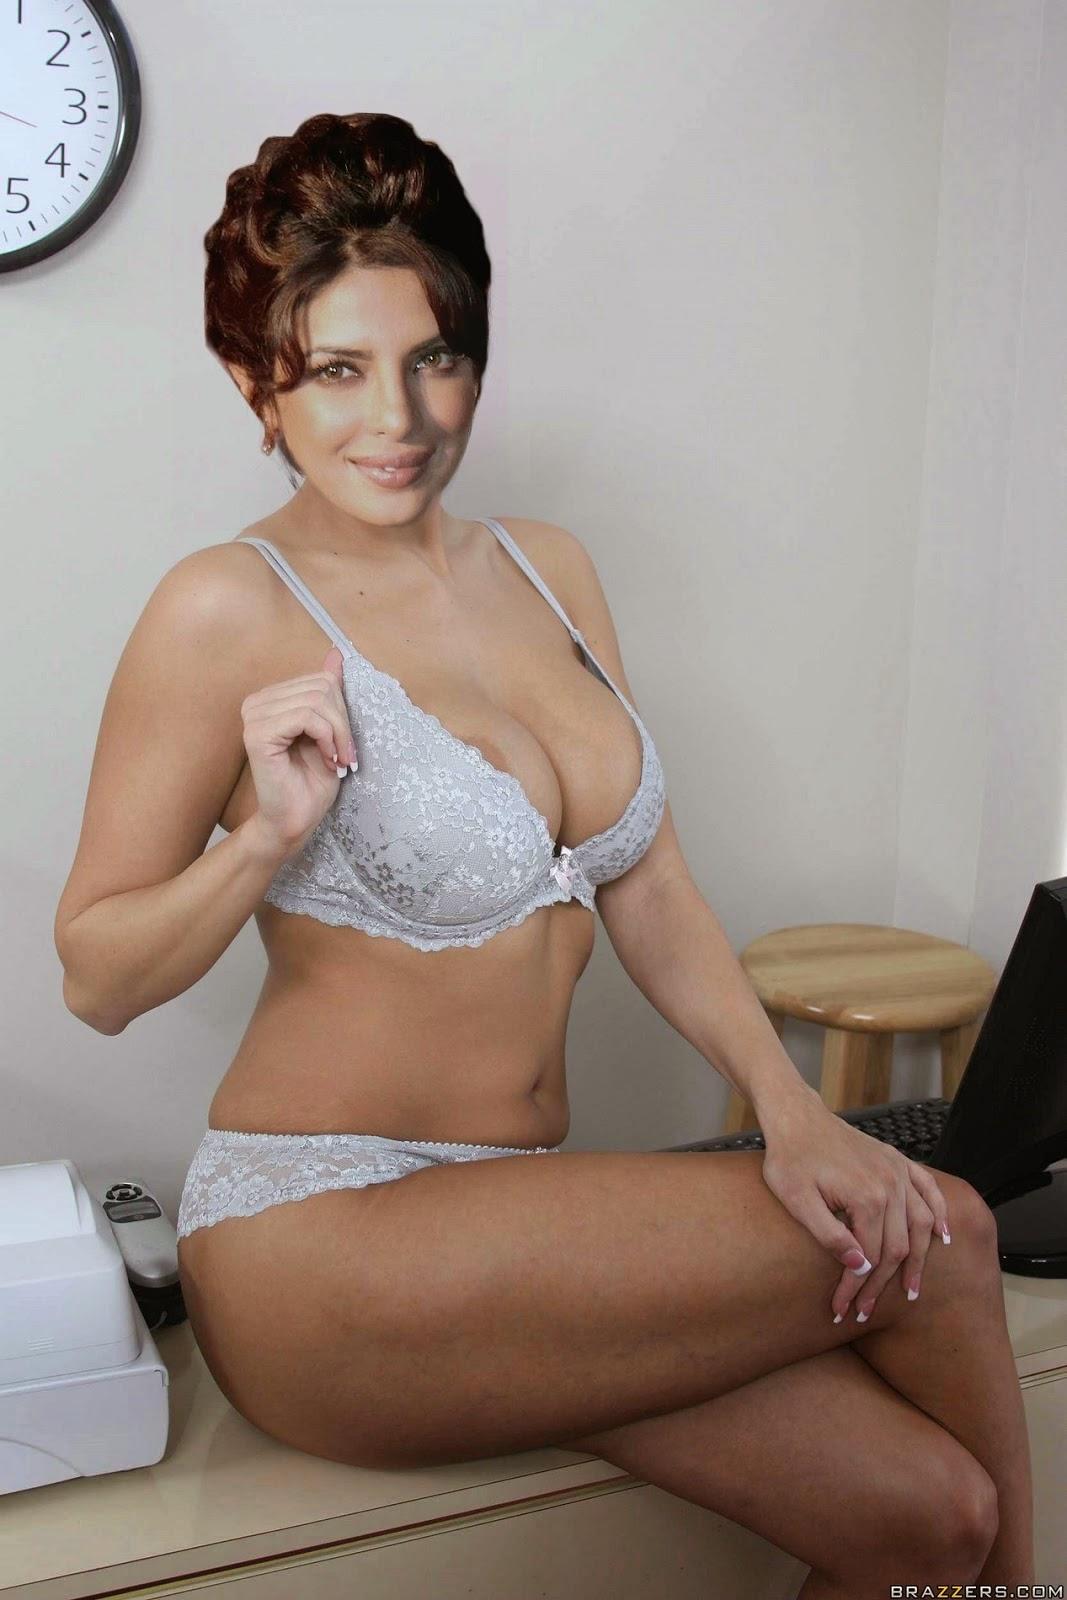 from Emerson photo porno priyanka chopra naked